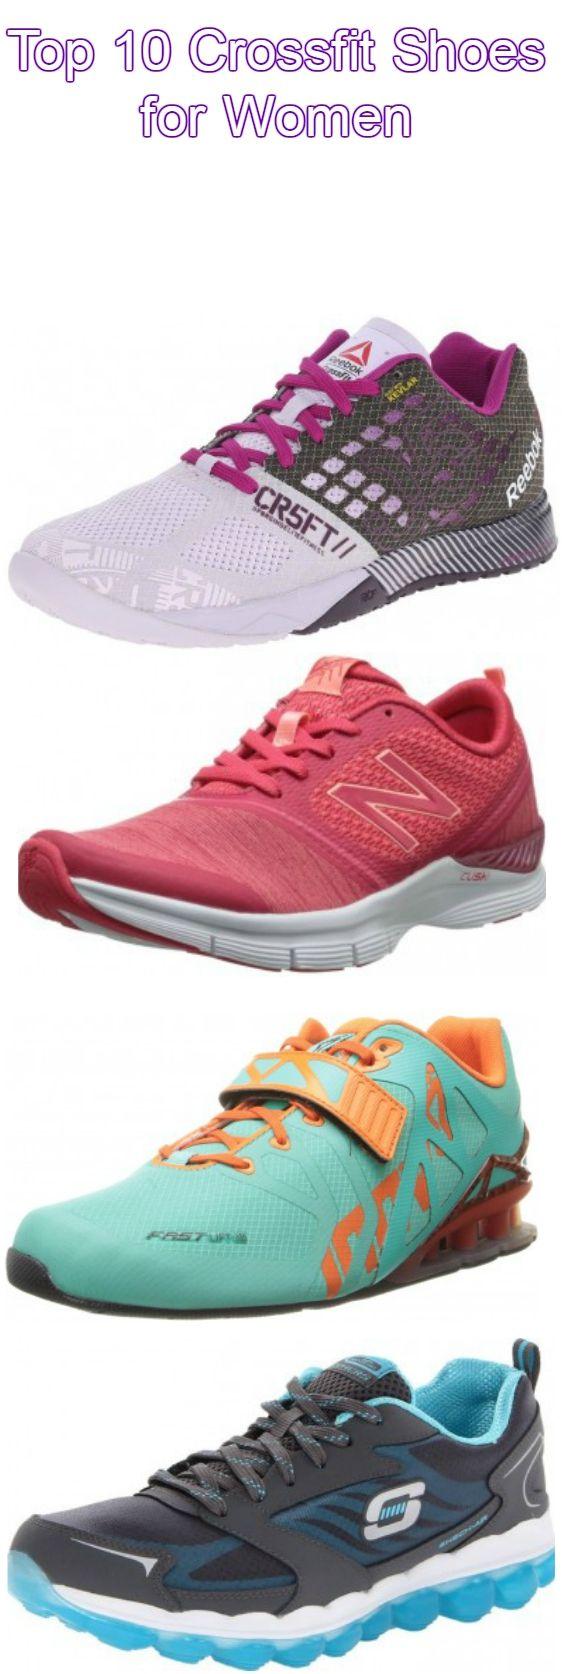 Best Crossfit Shoes for Women in 2015